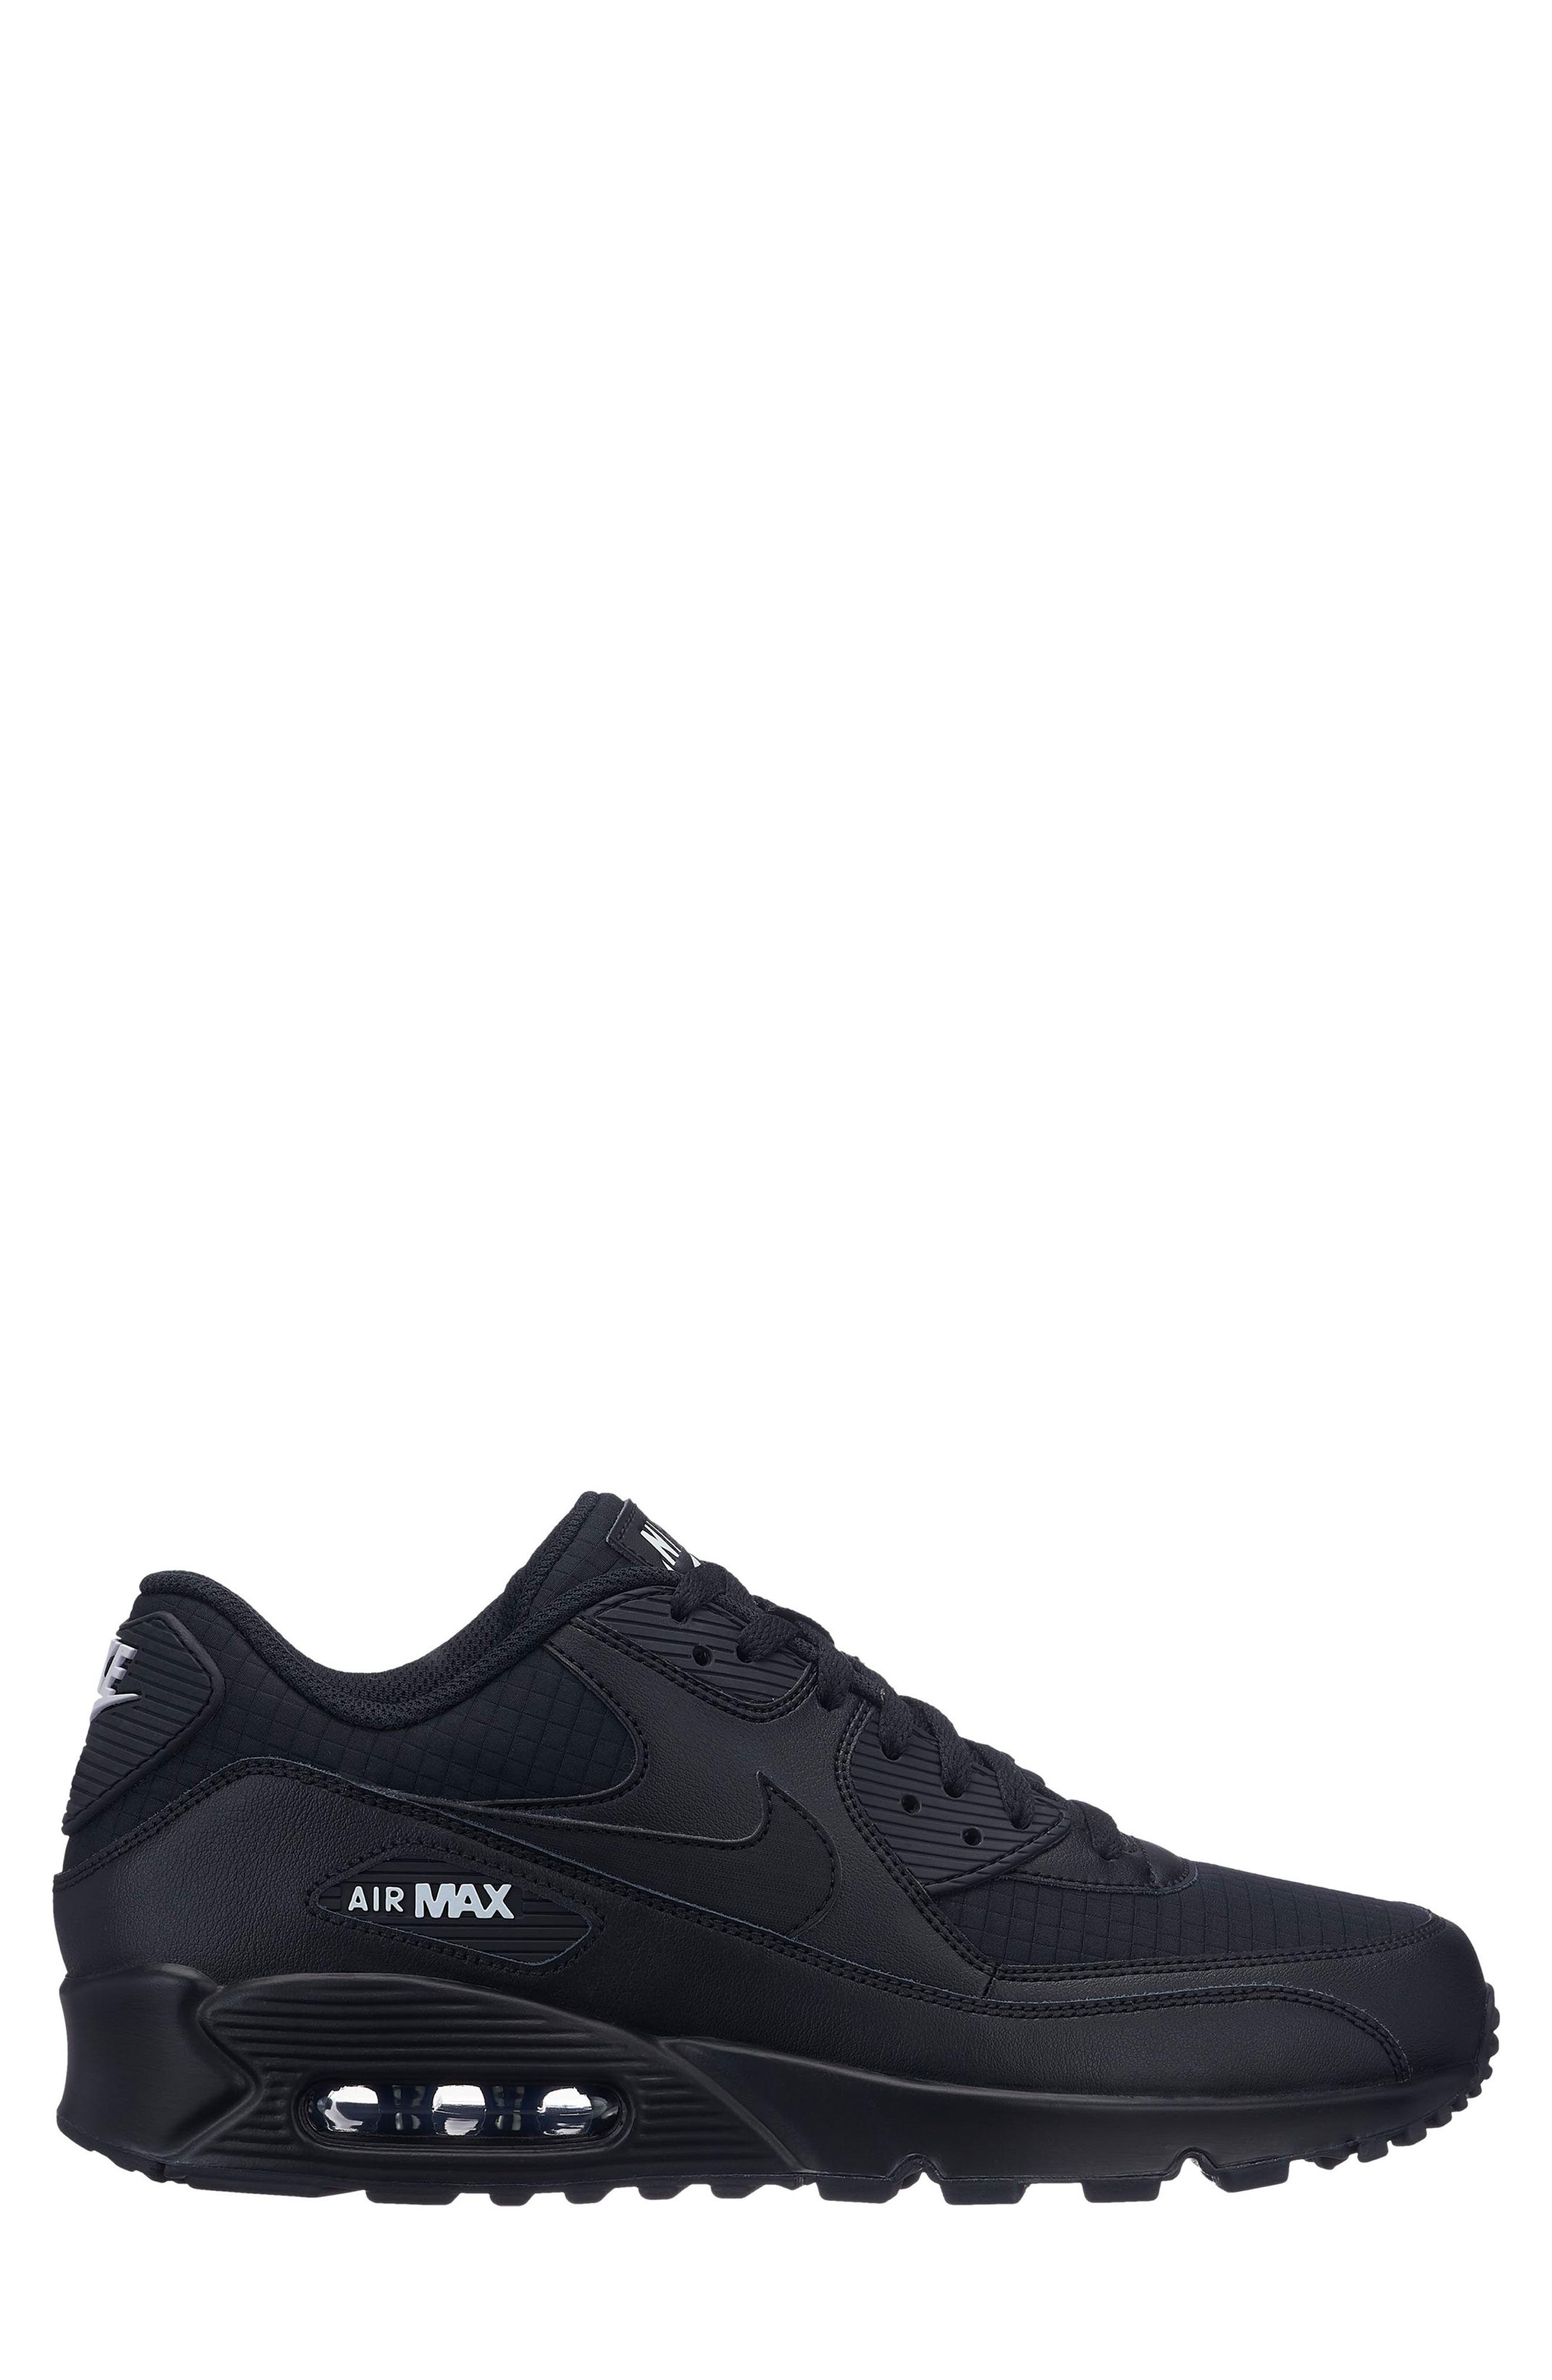 Air Max 90 Essential Sneaker, Main, color, BLACK/ WHITE